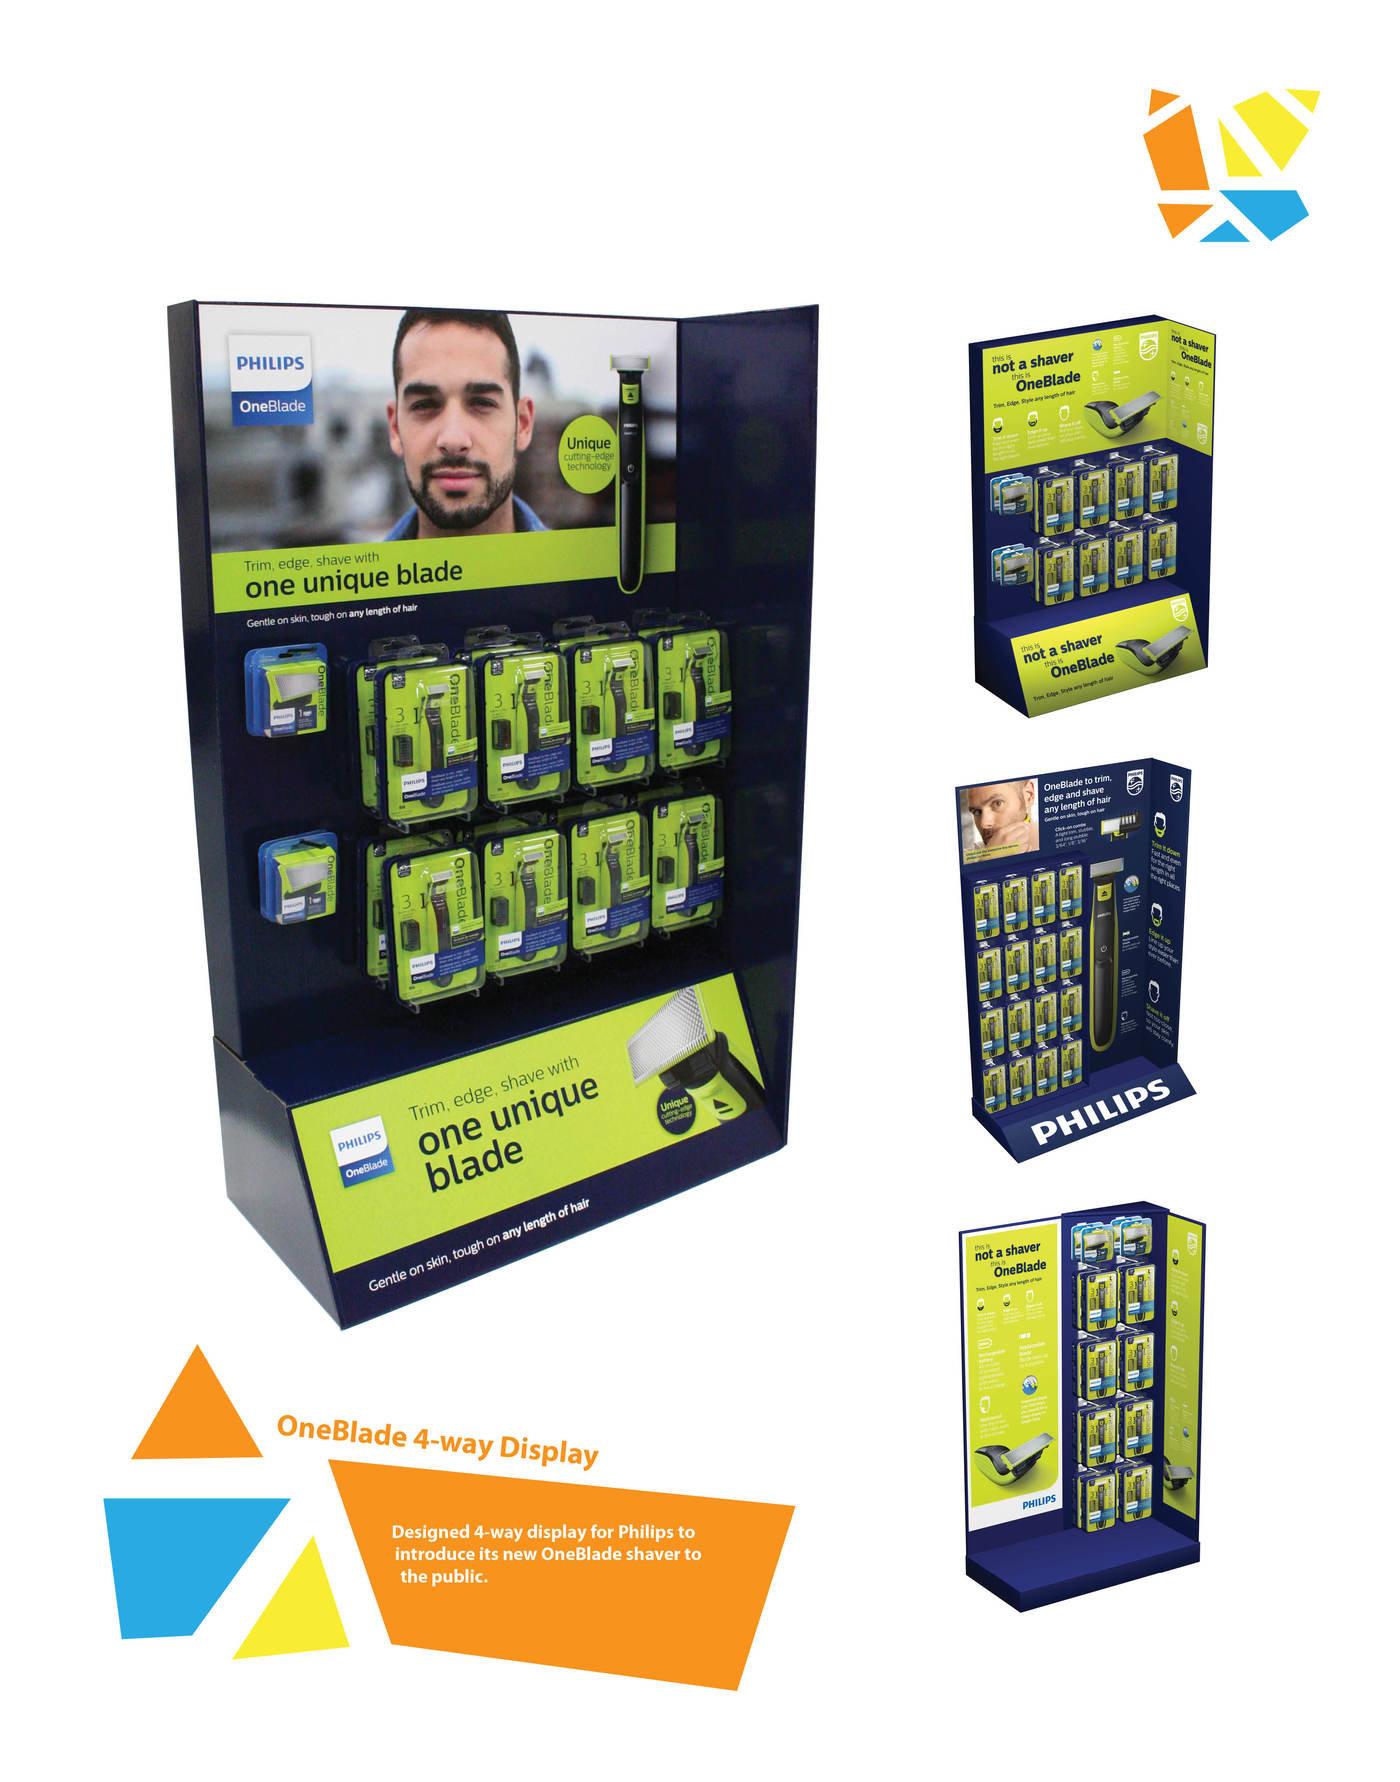 3 way displays free printable basketball court diagrams philips oneblade 4 display by heng sun at coroflot